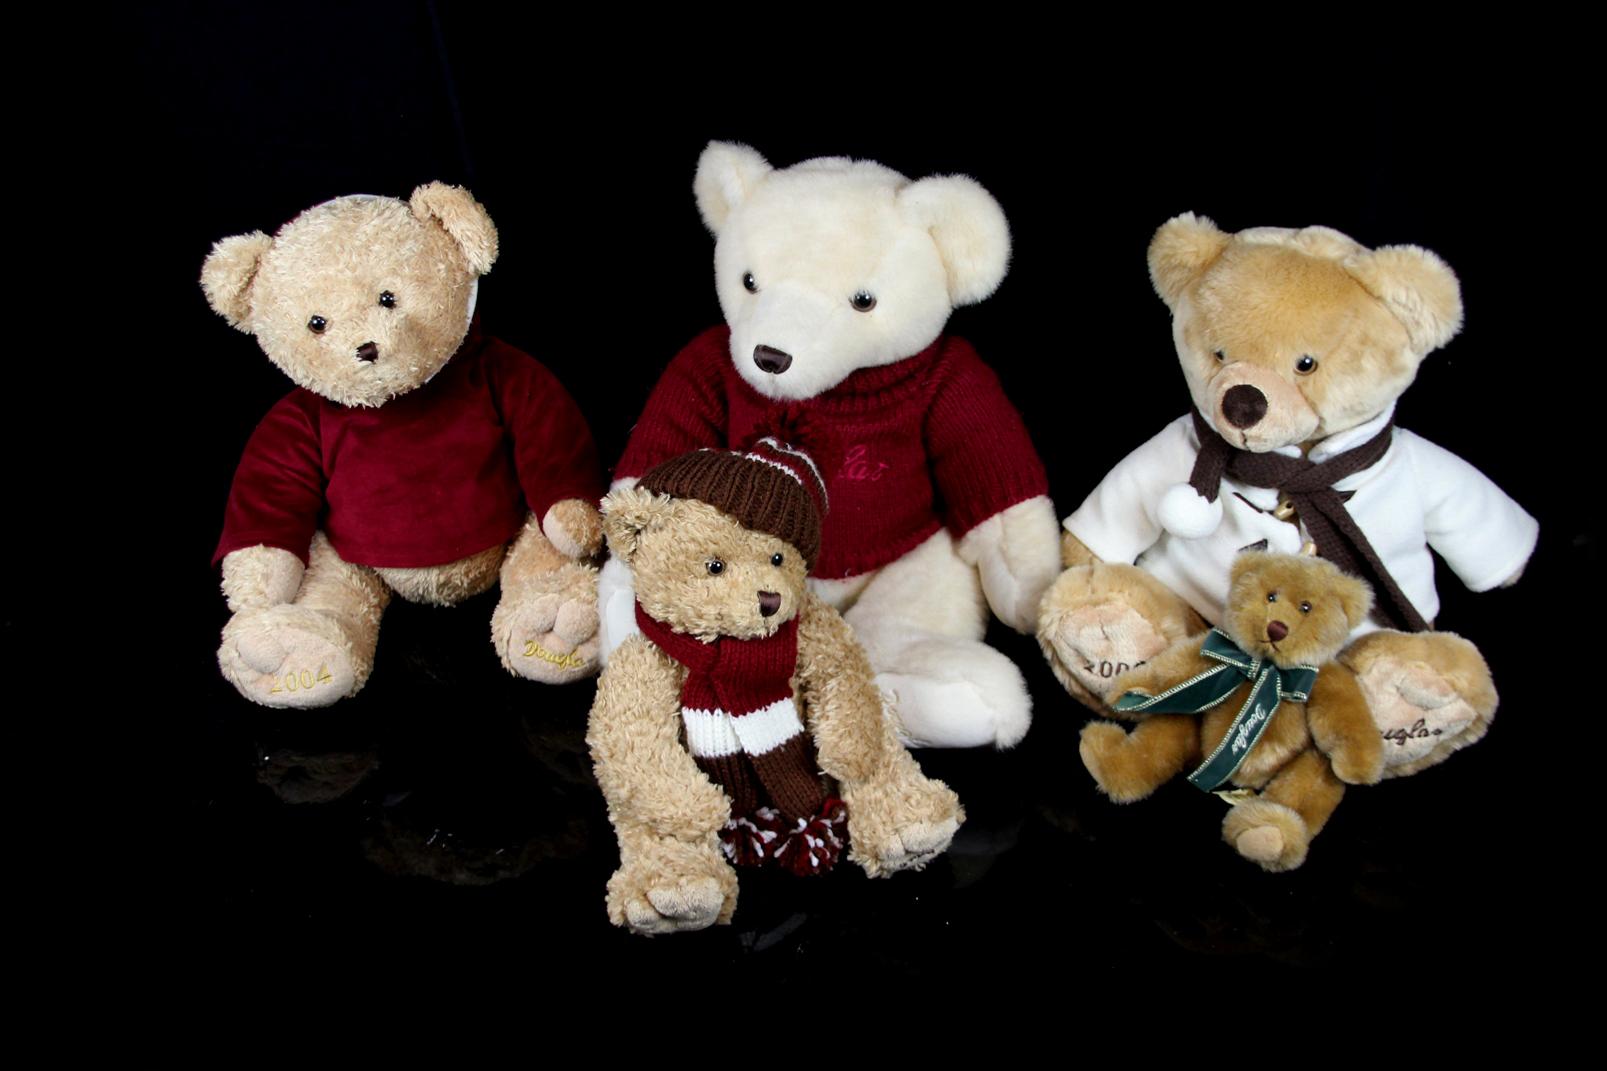 5 douglas sammelteddys 2004 2006 2009 sammler teddys. Black Bedroom Furniture Sets. Home Design Ideas